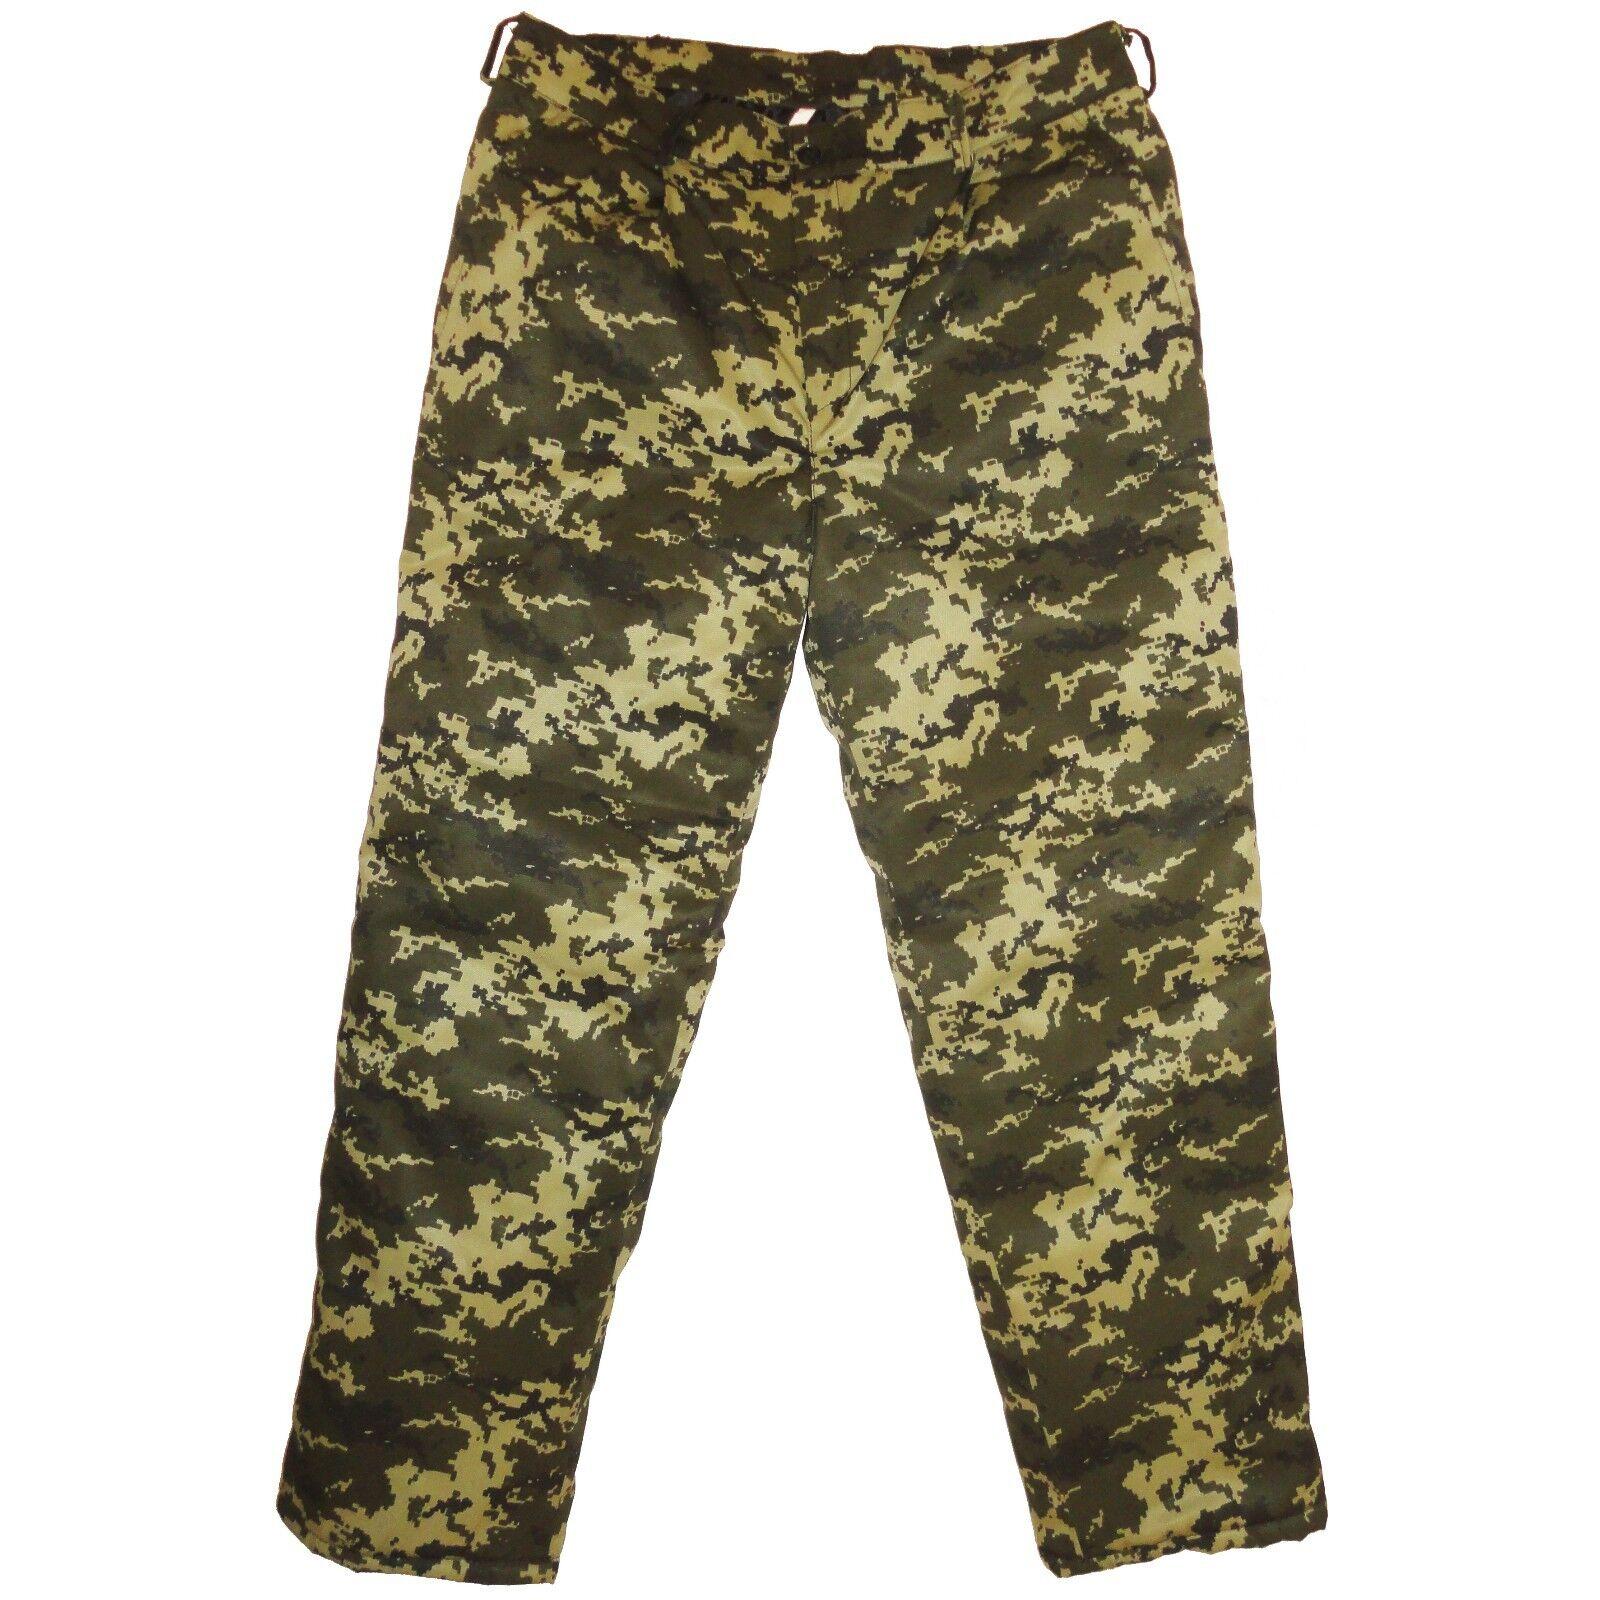 Winter Military Army Green Digital Camo Trousers Pants Russian Ukrainian Uniform